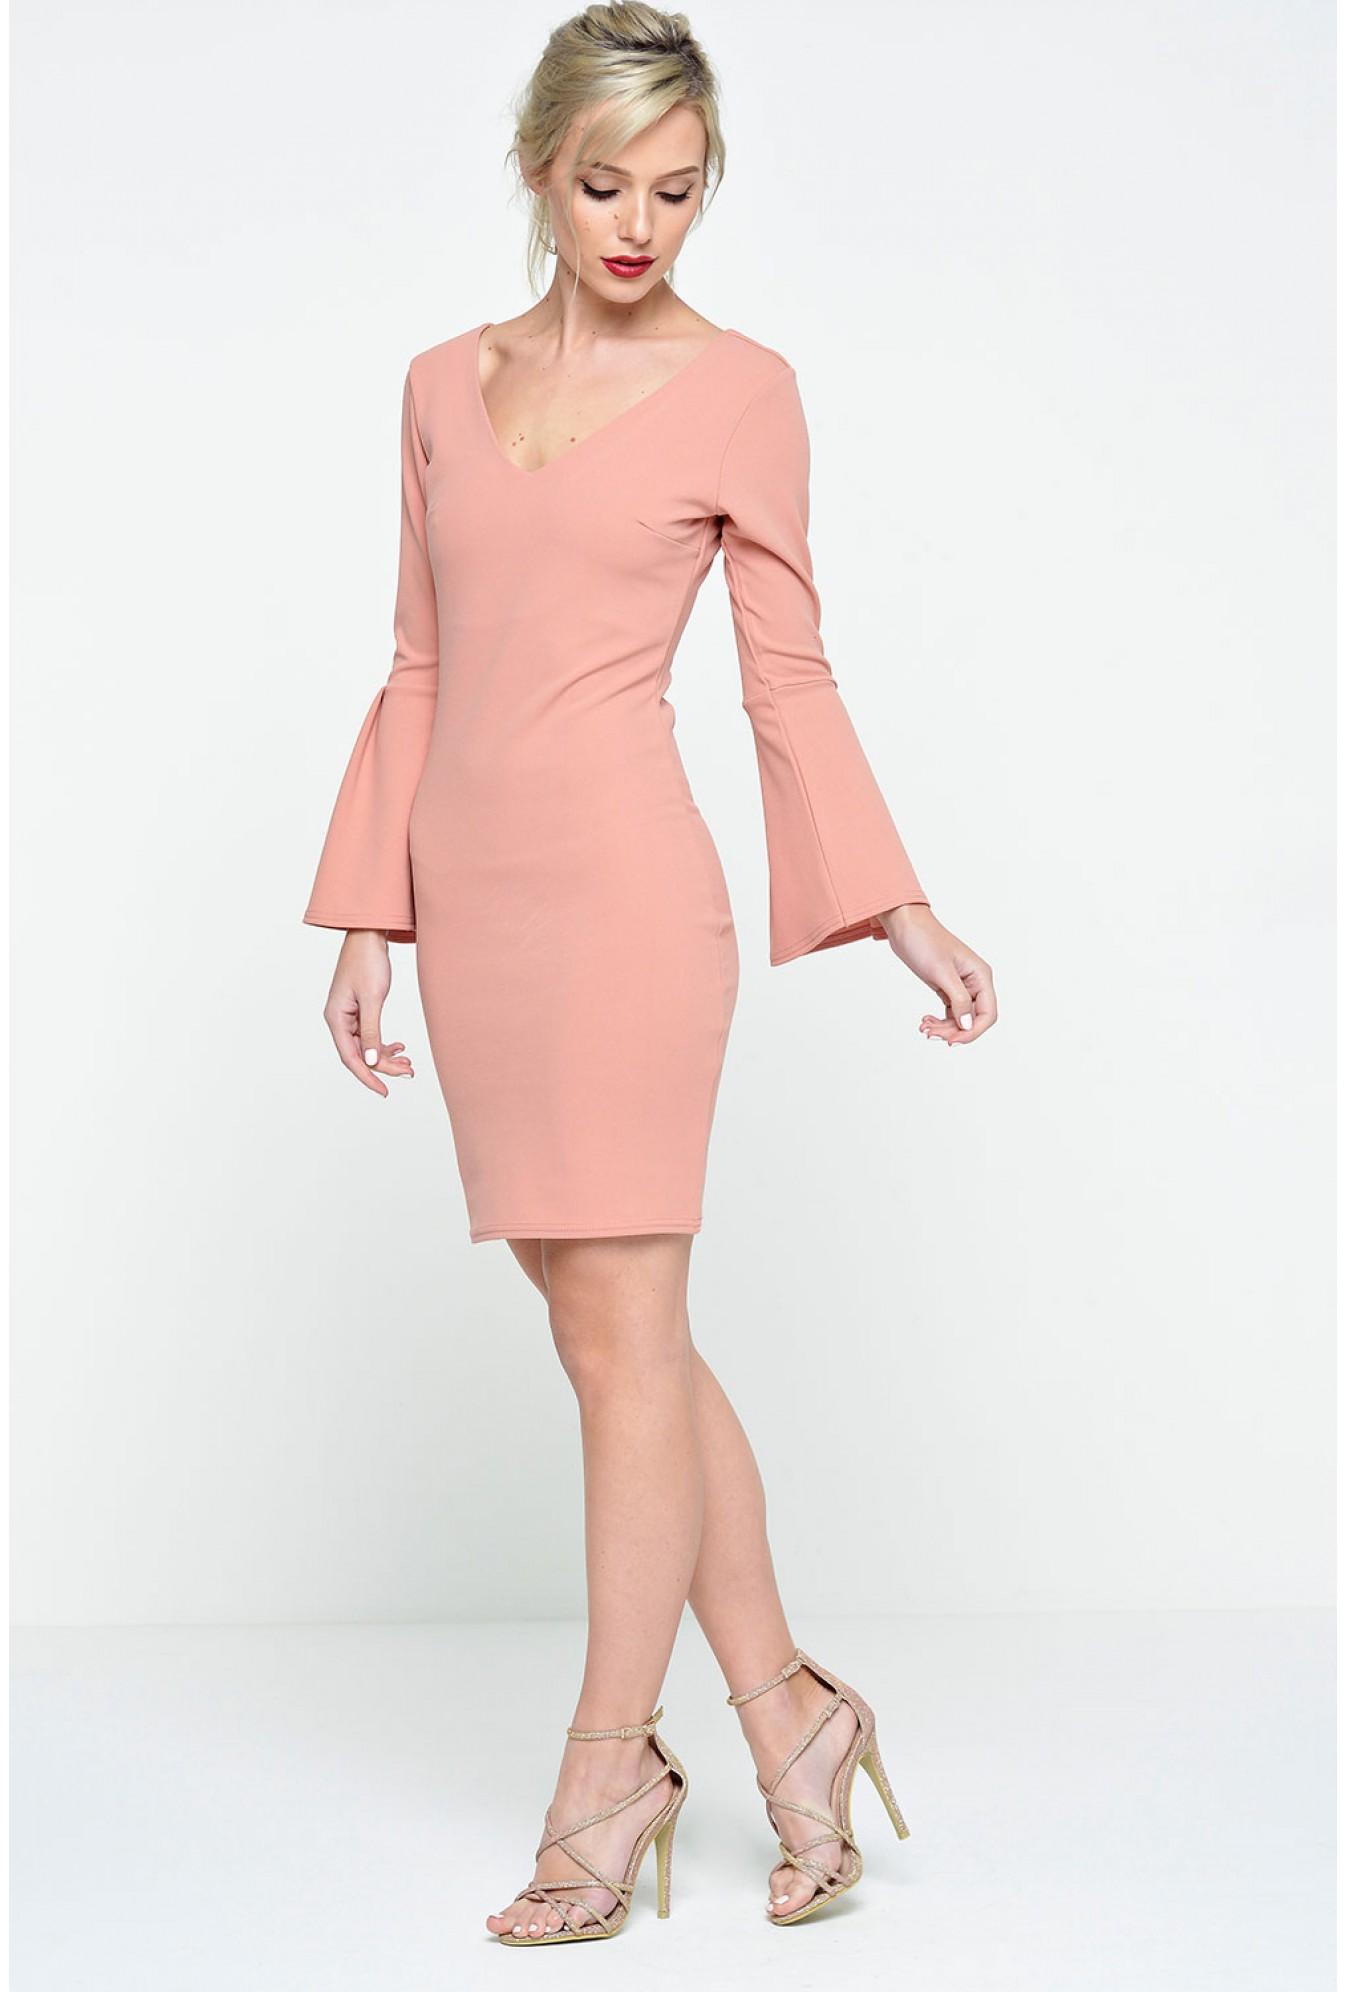 c8c34978 Premier De Toi Zara Bell Sleeve Bodycon Dress in Dusty Pink | iCLOTHING